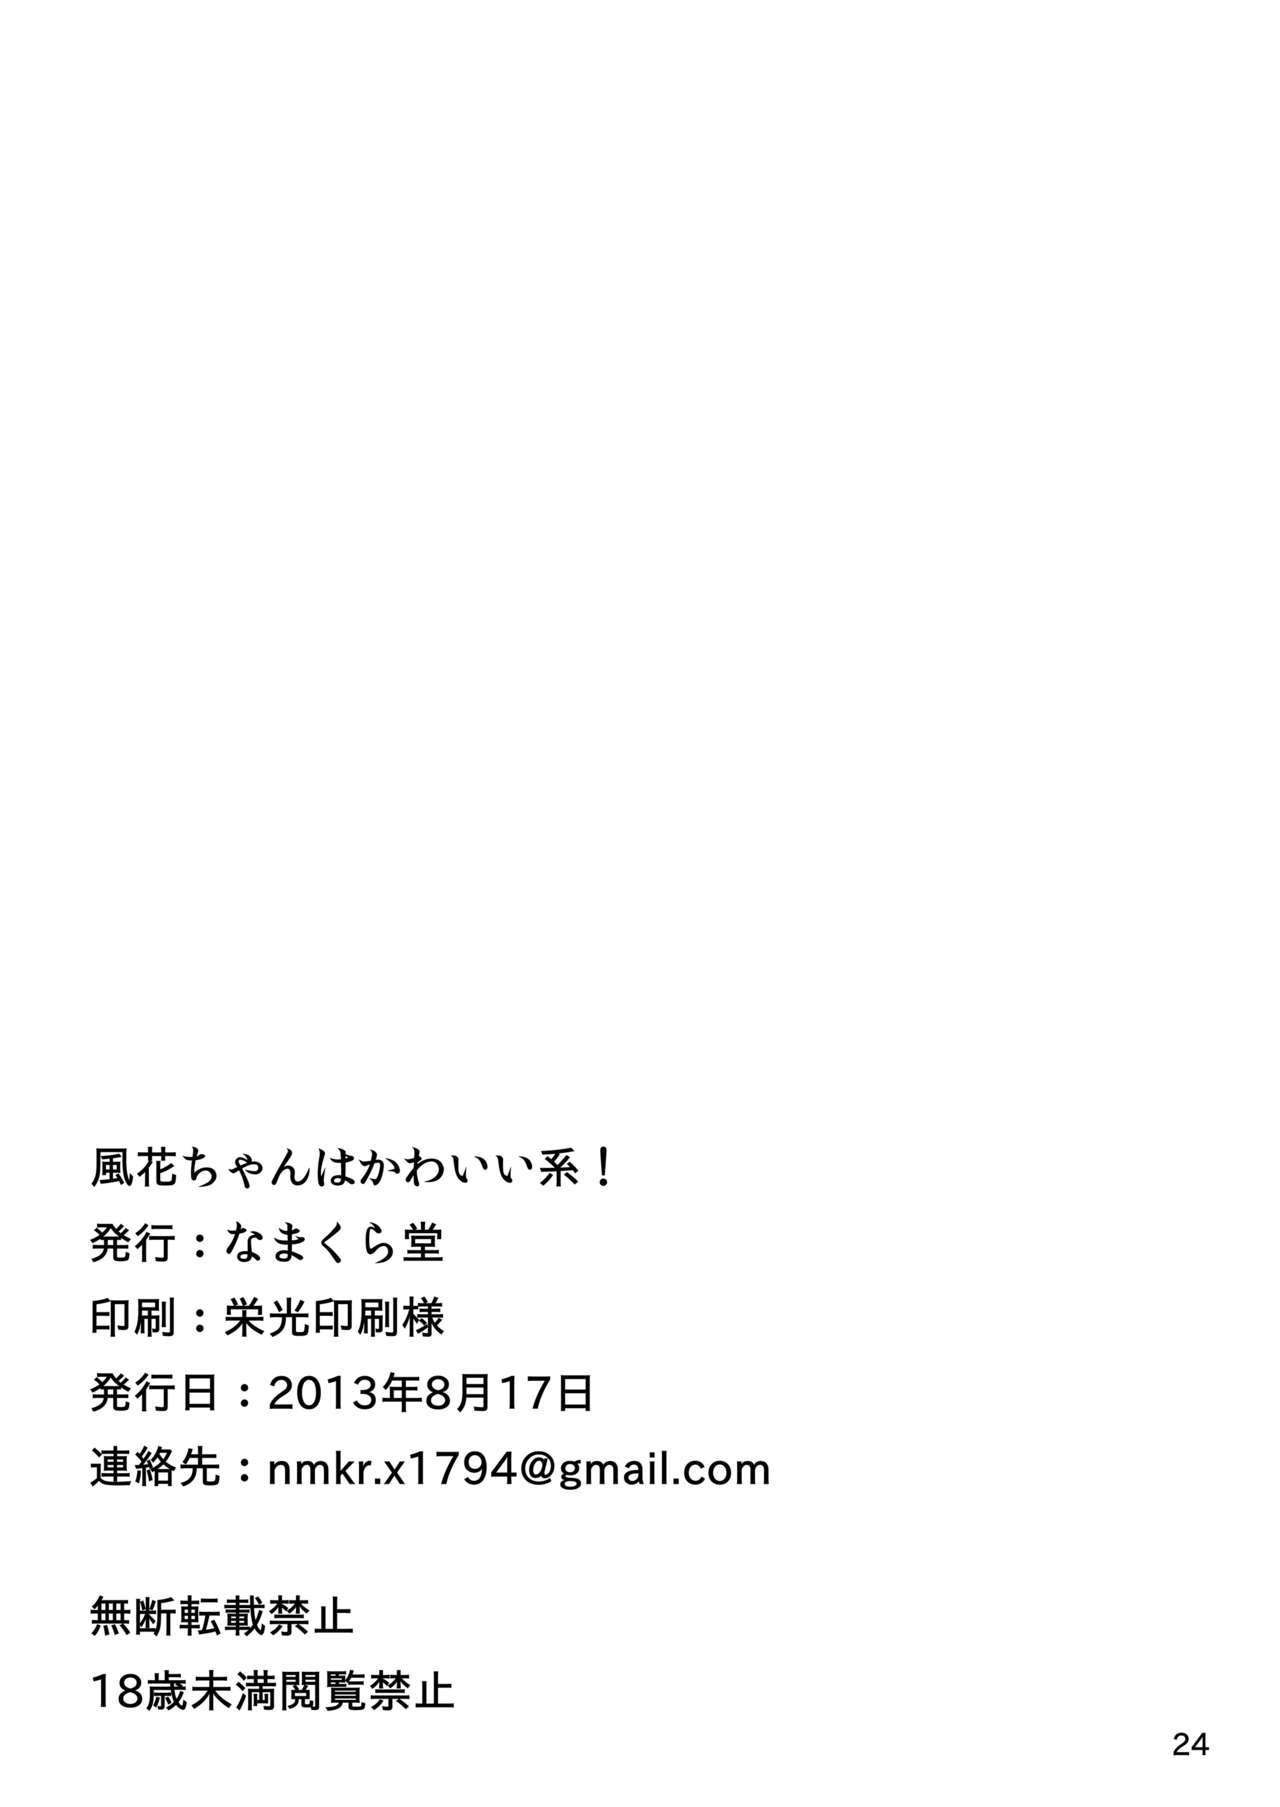 [Namakura Dou (Namakura)] Fuuka-chan wa Kawaii-kei! (THE IDOLM@STER MILLION LIVE!) [Digital] 23